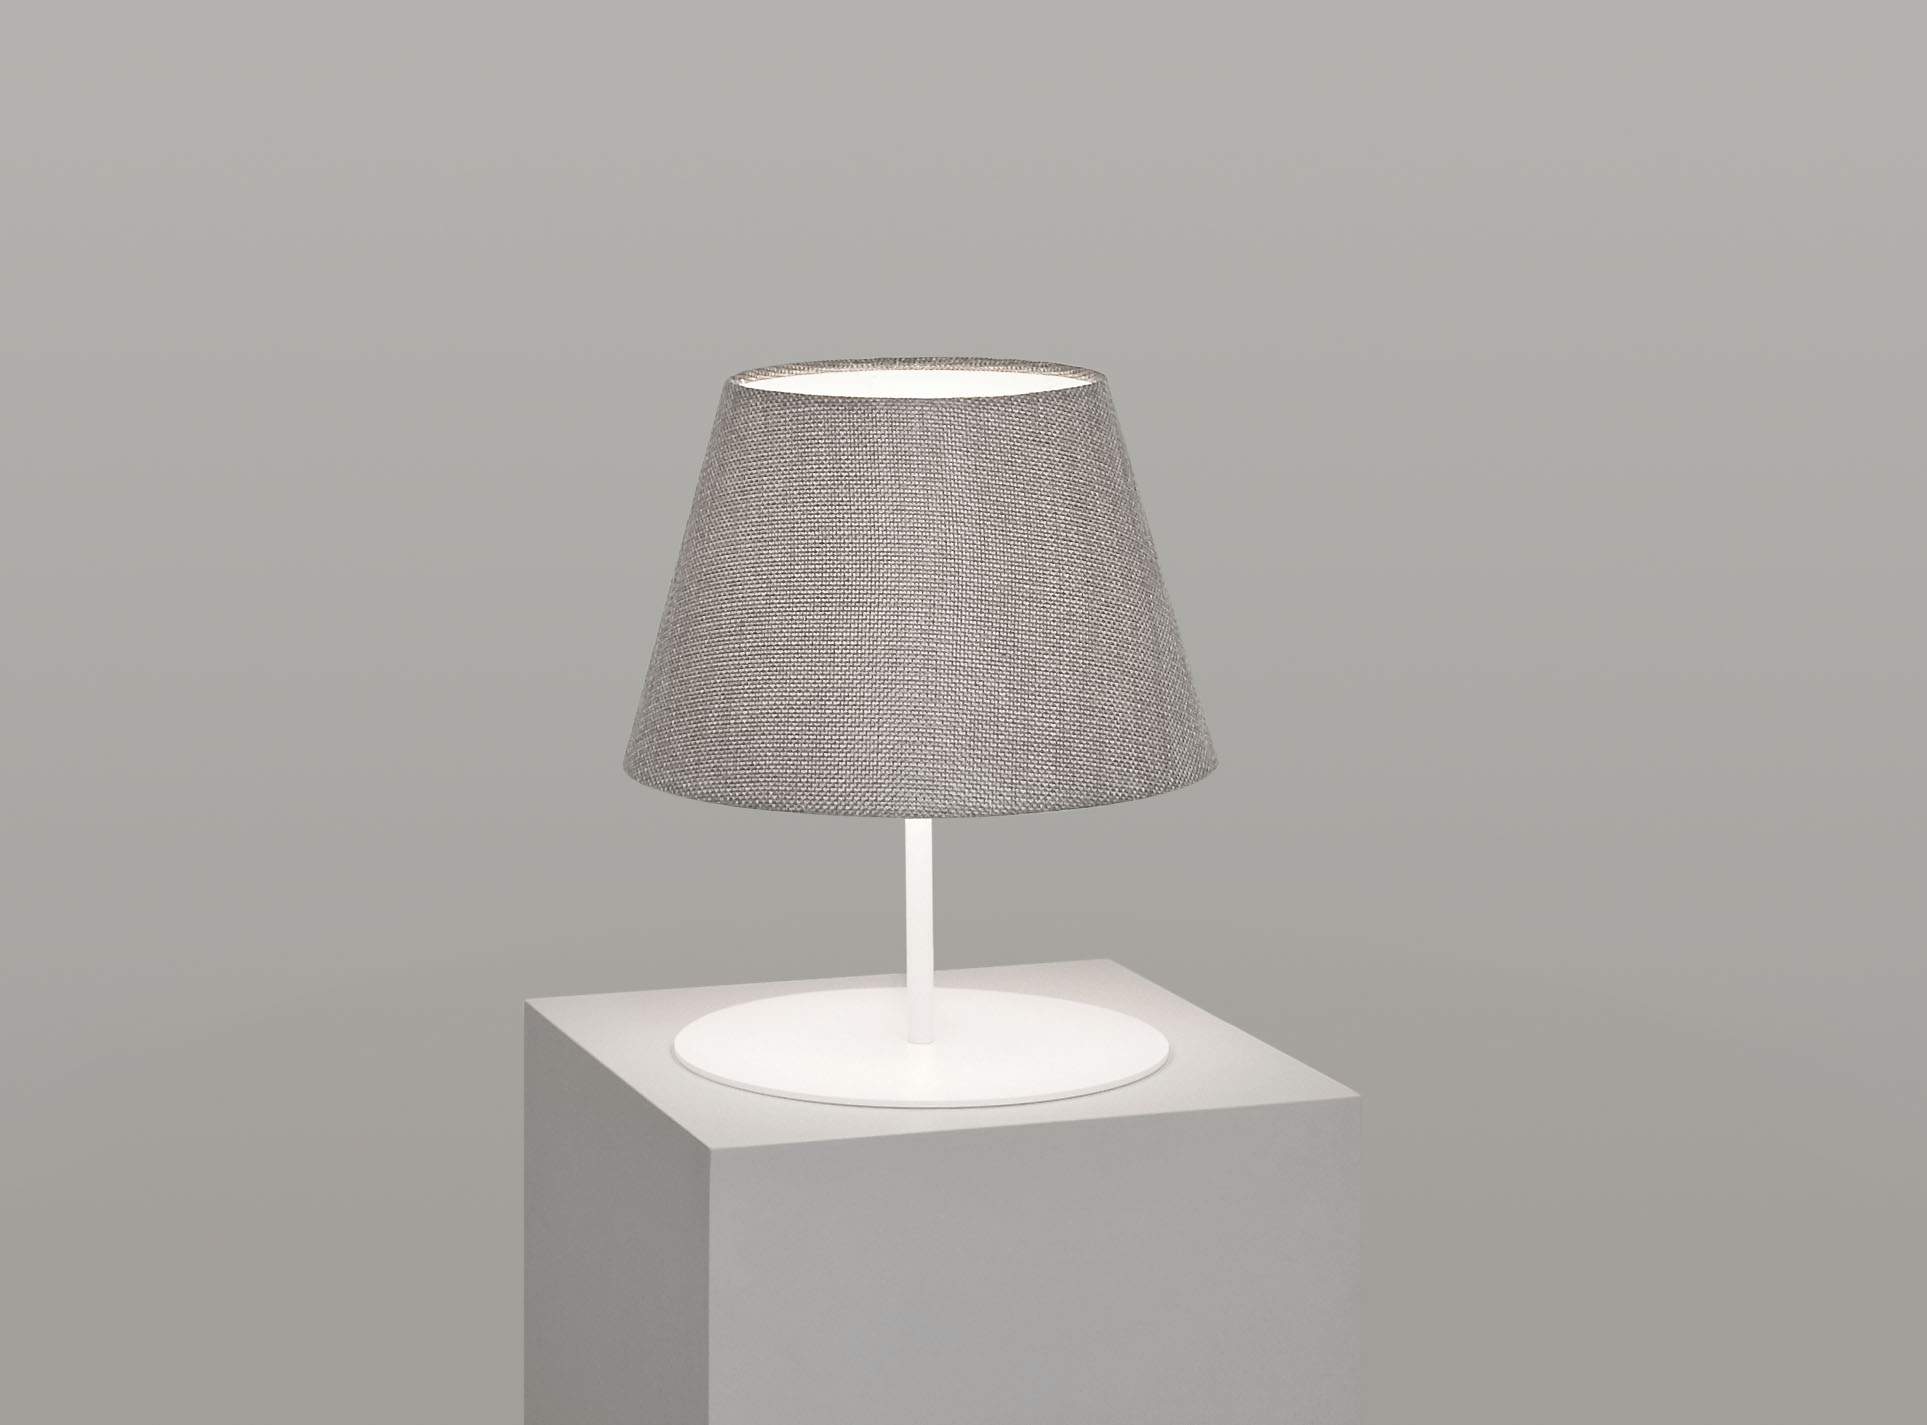 pegasus_lamp_white_base_titanium.jpg